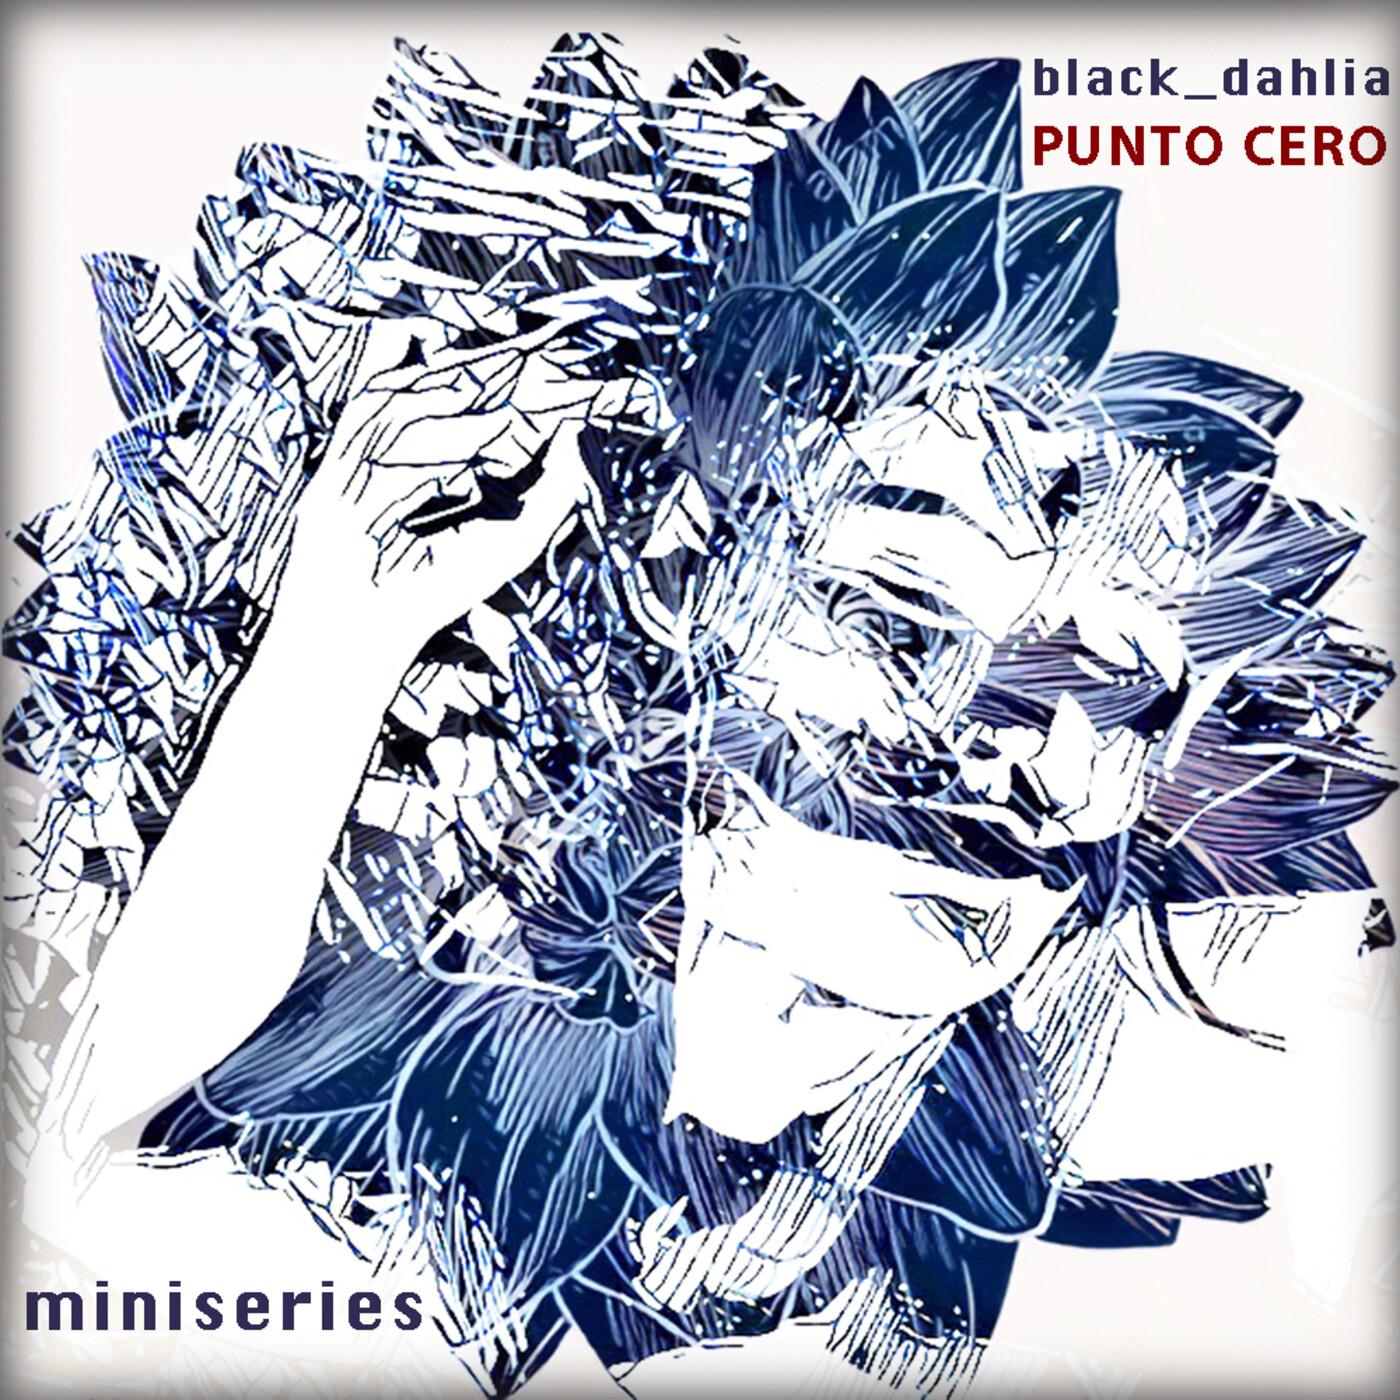 Miniseries Black Dahlia Punto Cero6 : Algo Extraño Tenía ese Chico (La Dalia Negra)